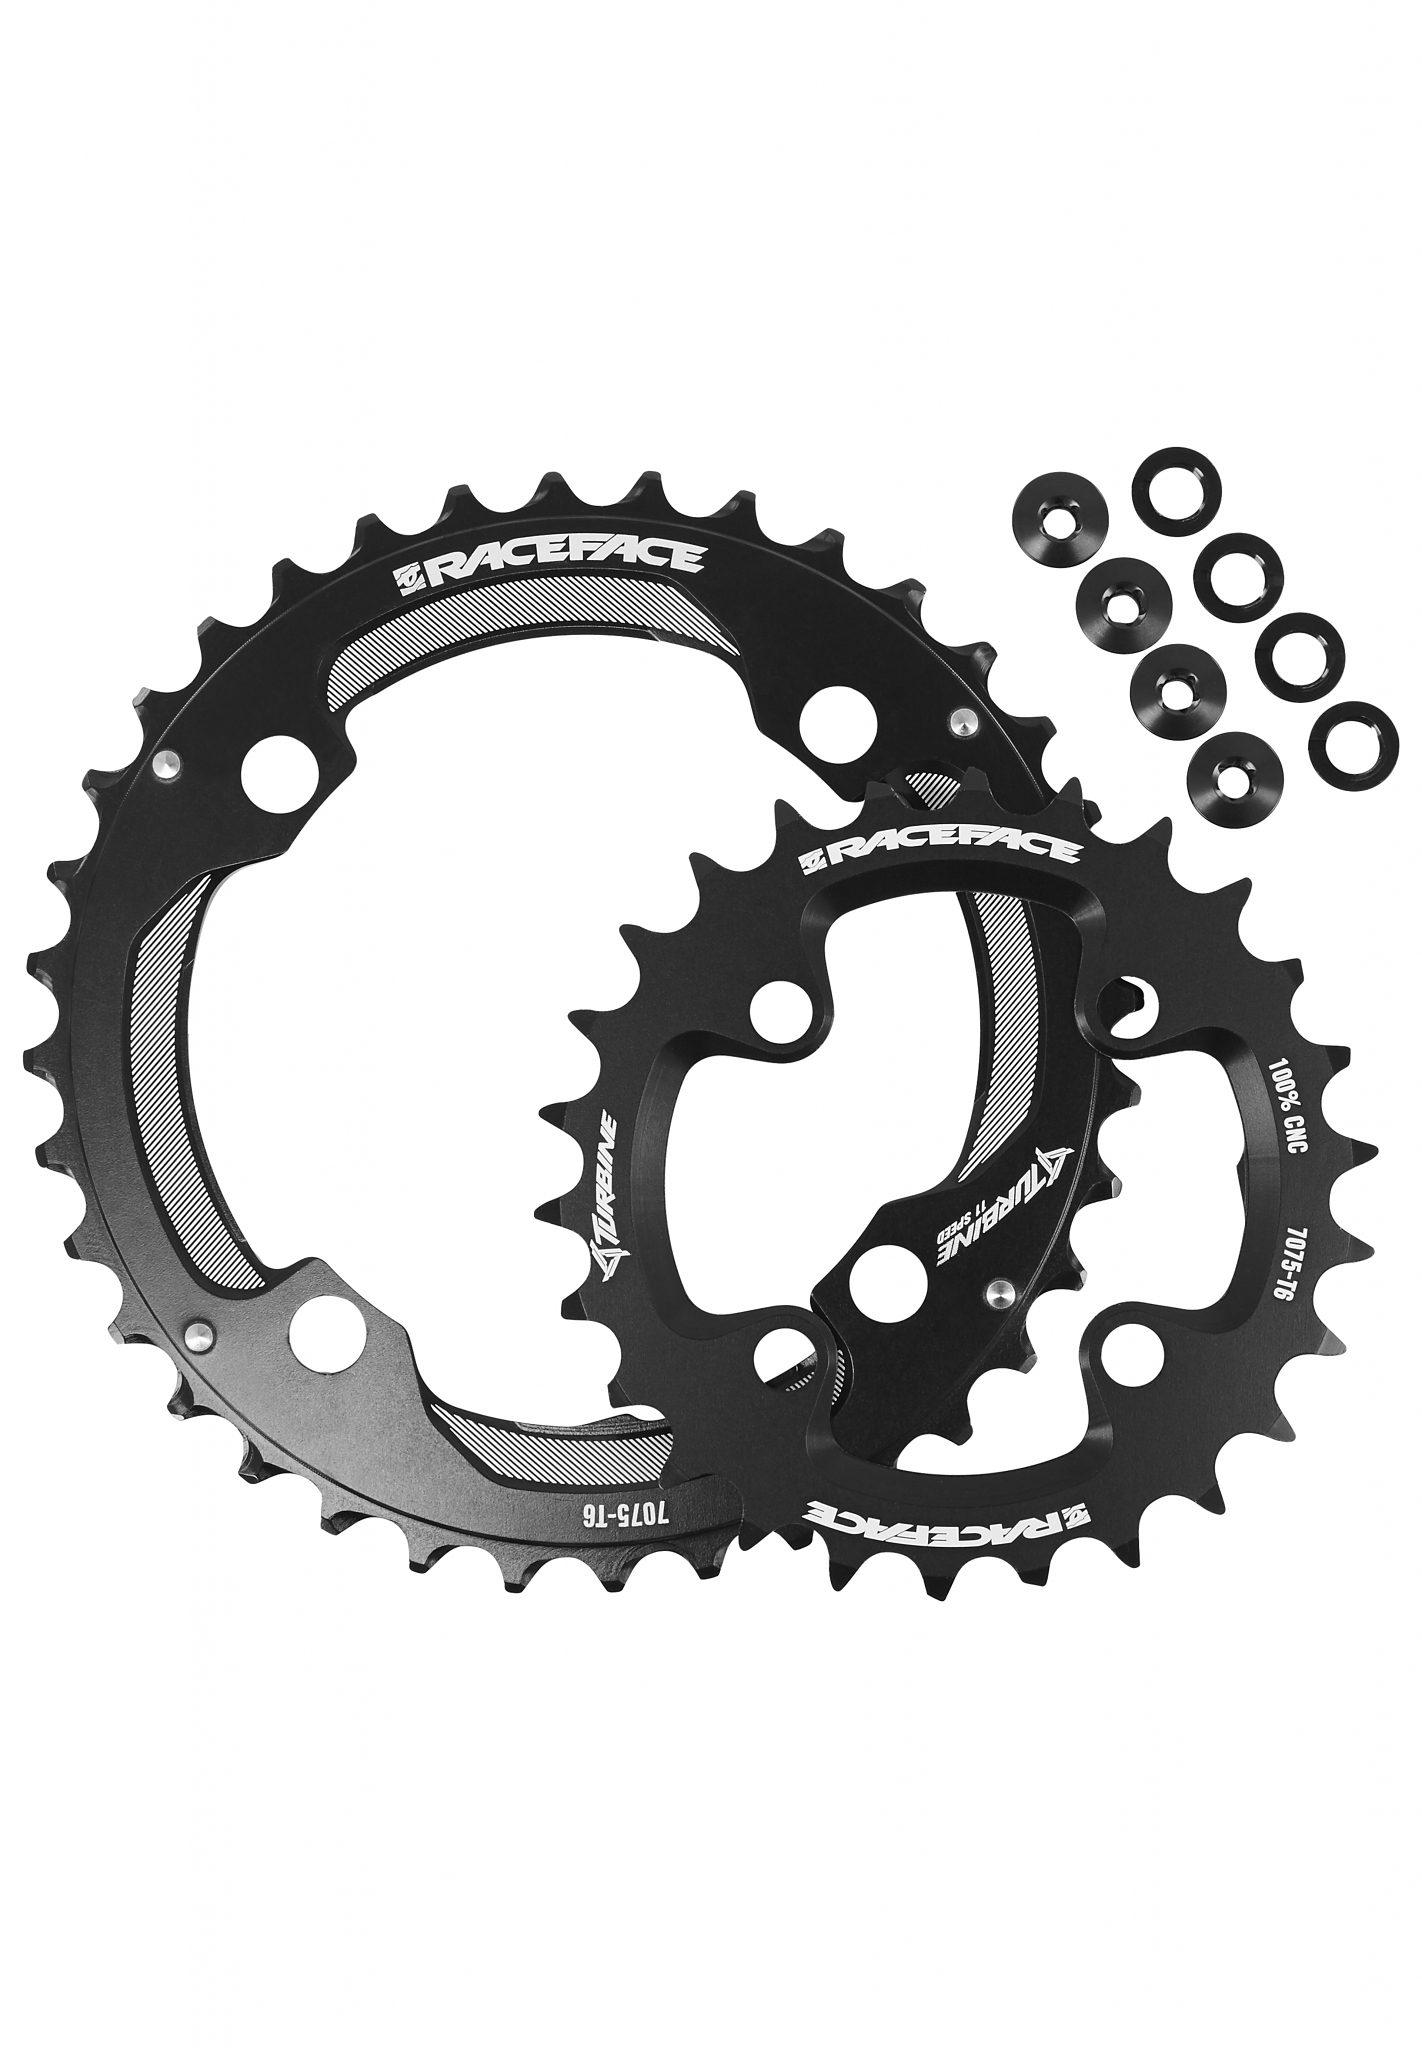 Race Face Kettenblatt »Race Face Turbine Chainring Set 4 Bolt 26/36 2x11«